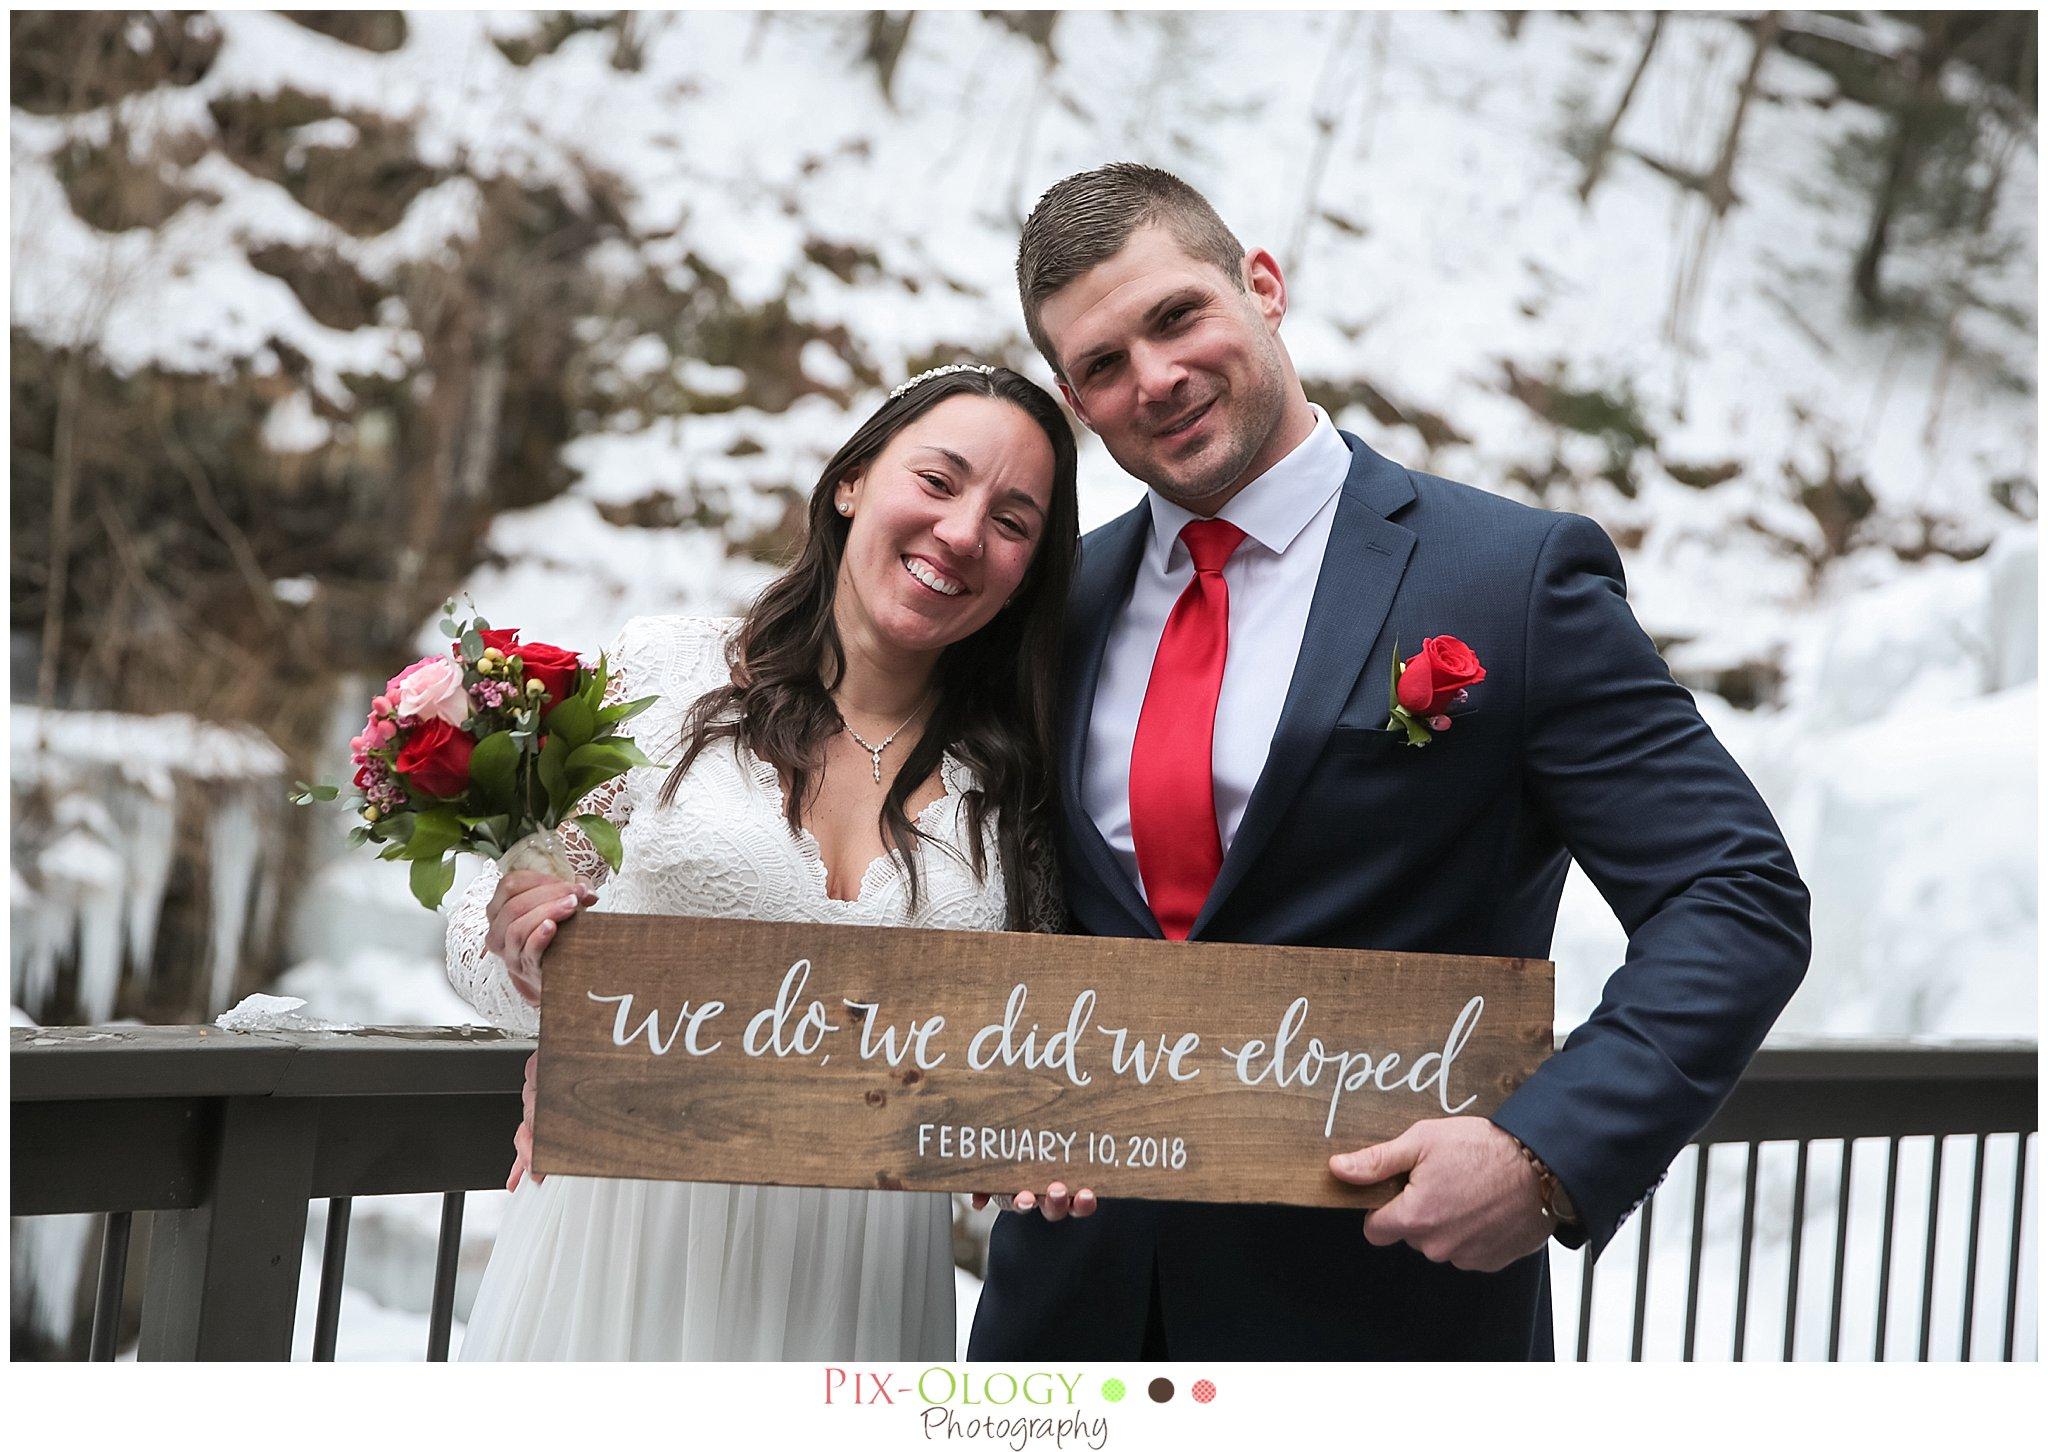 pix-ology-photography-wedding-ledges-hotel-bride-and-groom-elopment